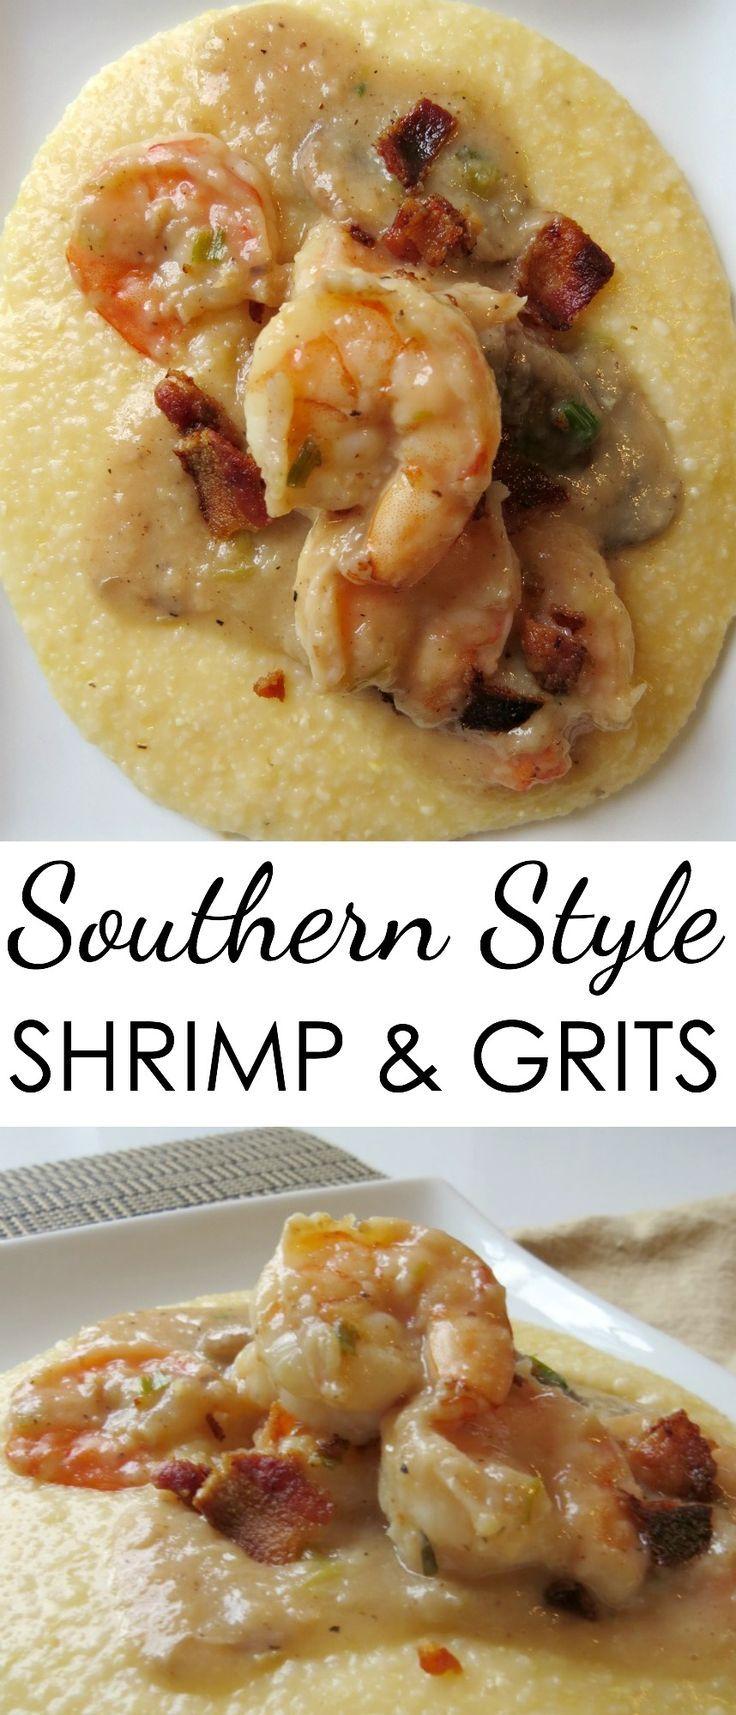 Easy Shrimp Grits Recipes - Written Reality #shrimpandgrits